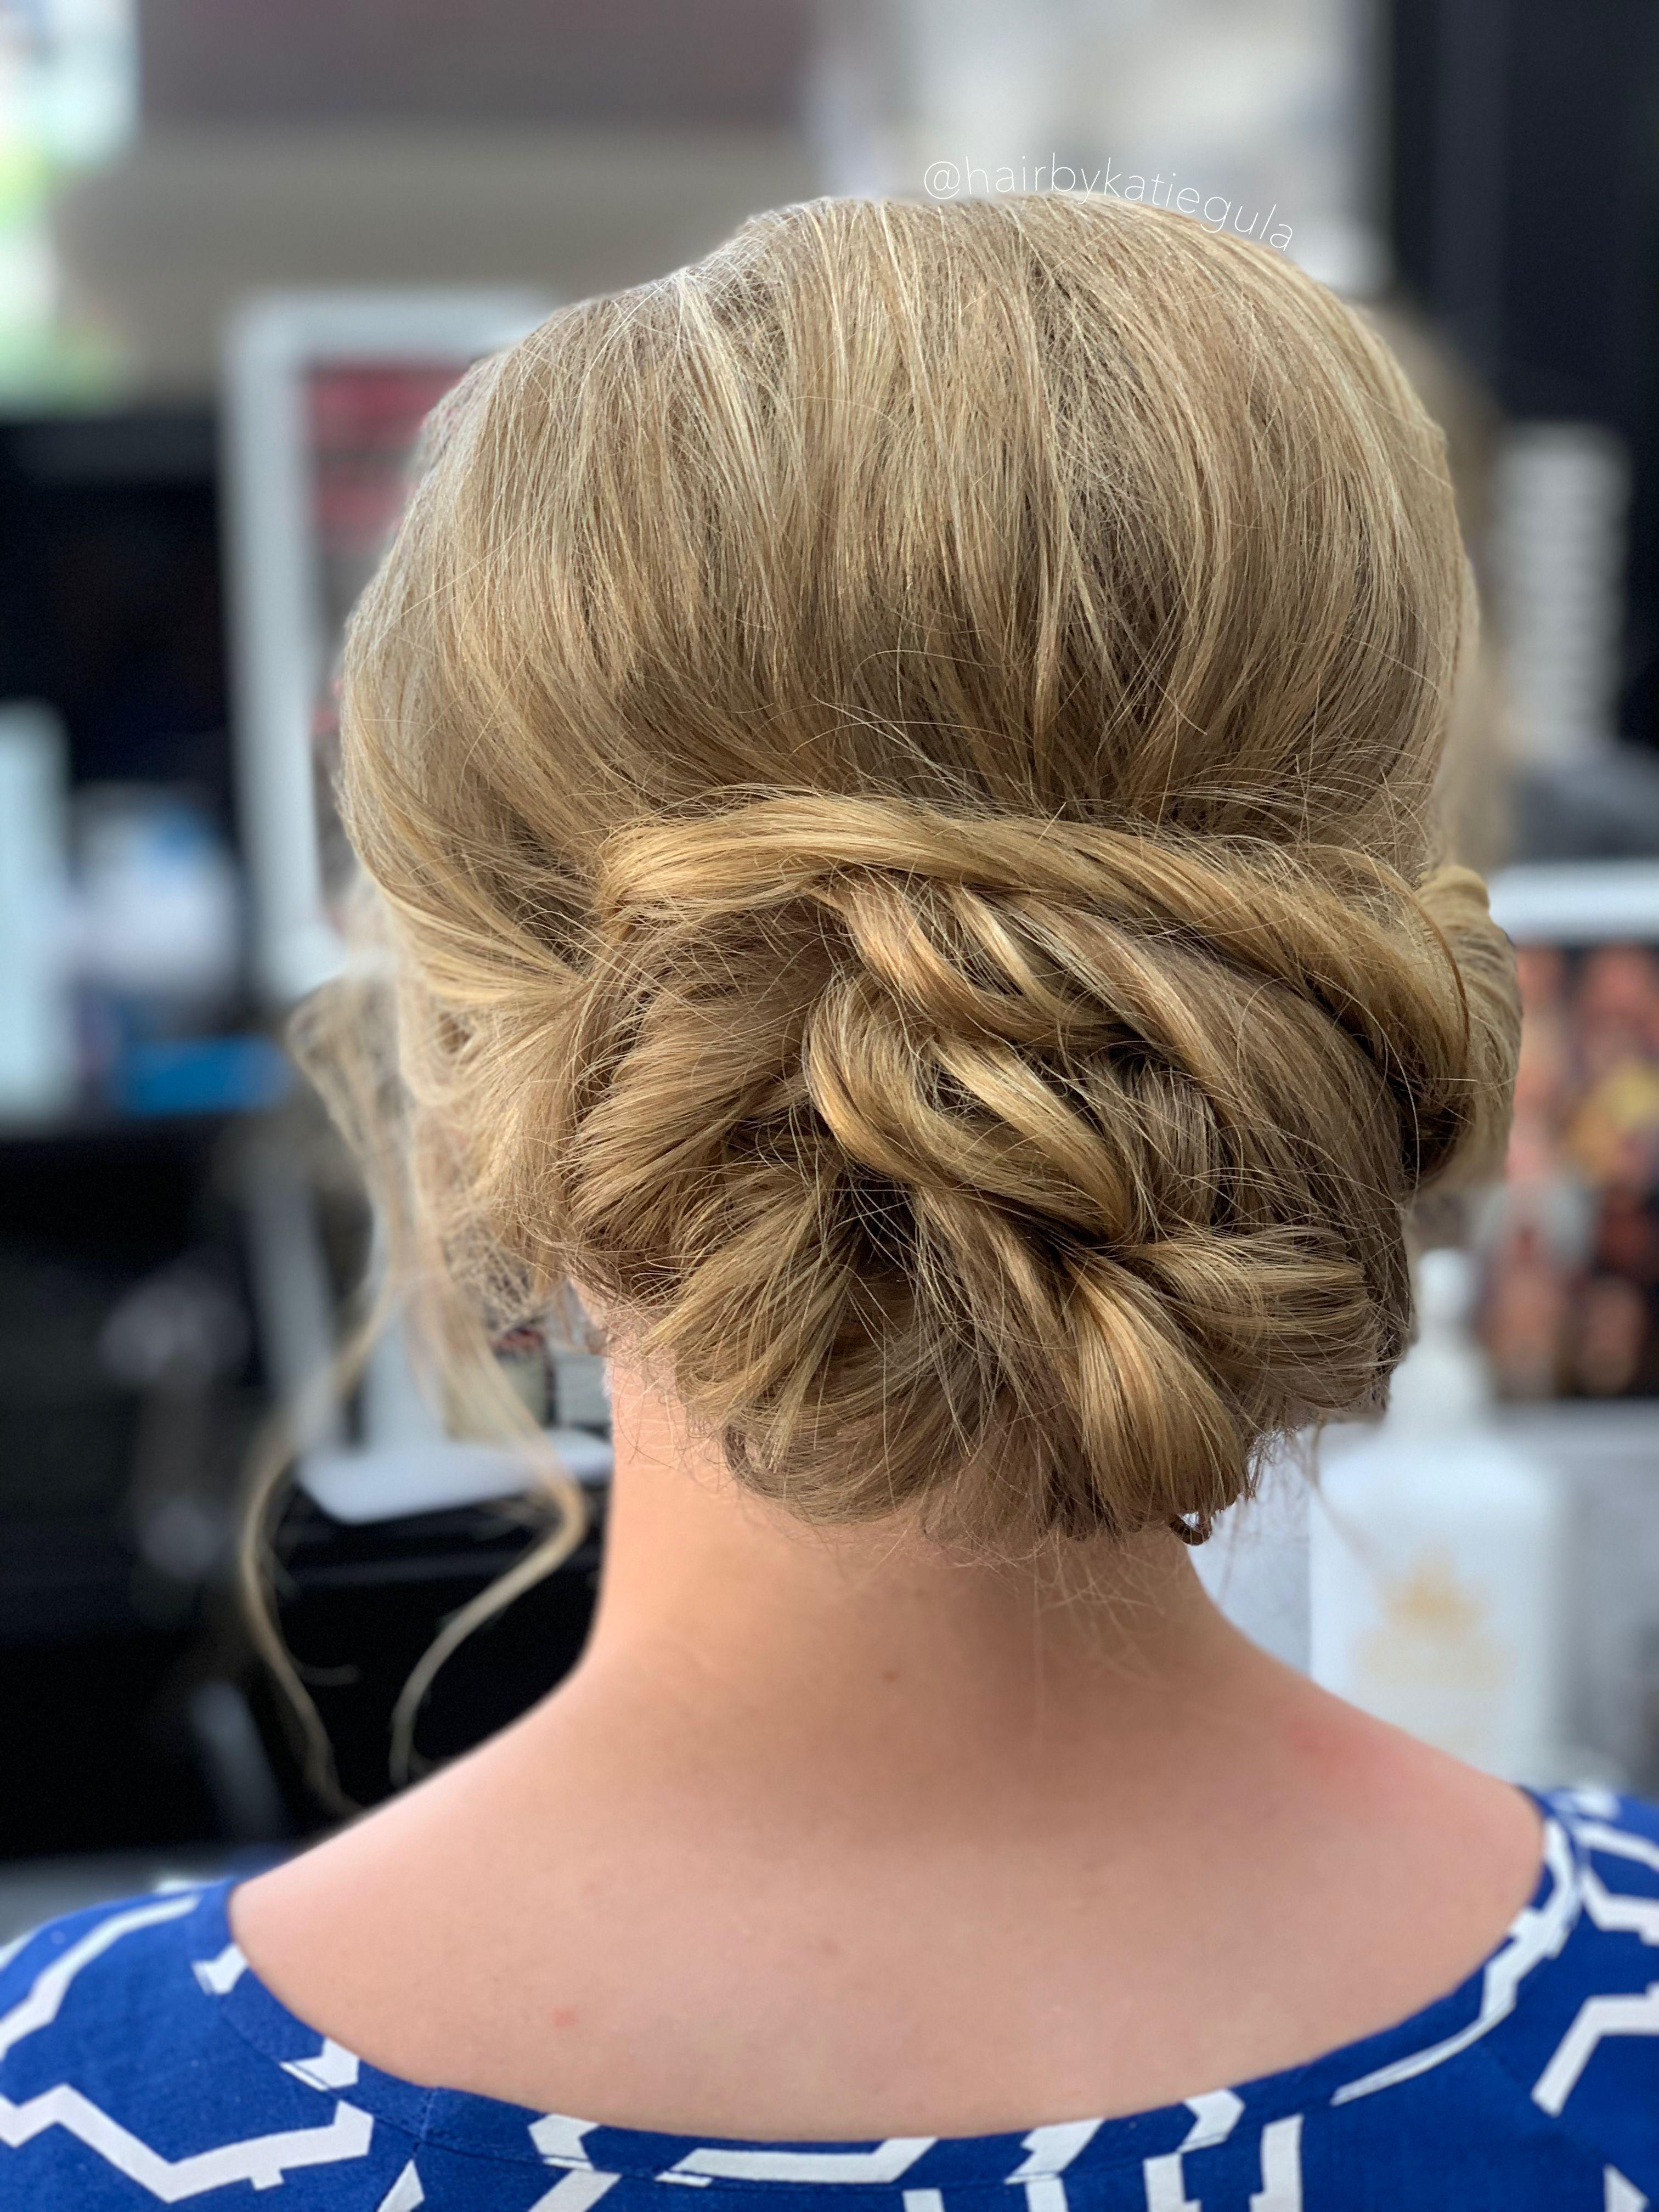 Prom Hair Updo   Prom hair updo, Prom hair, Hair